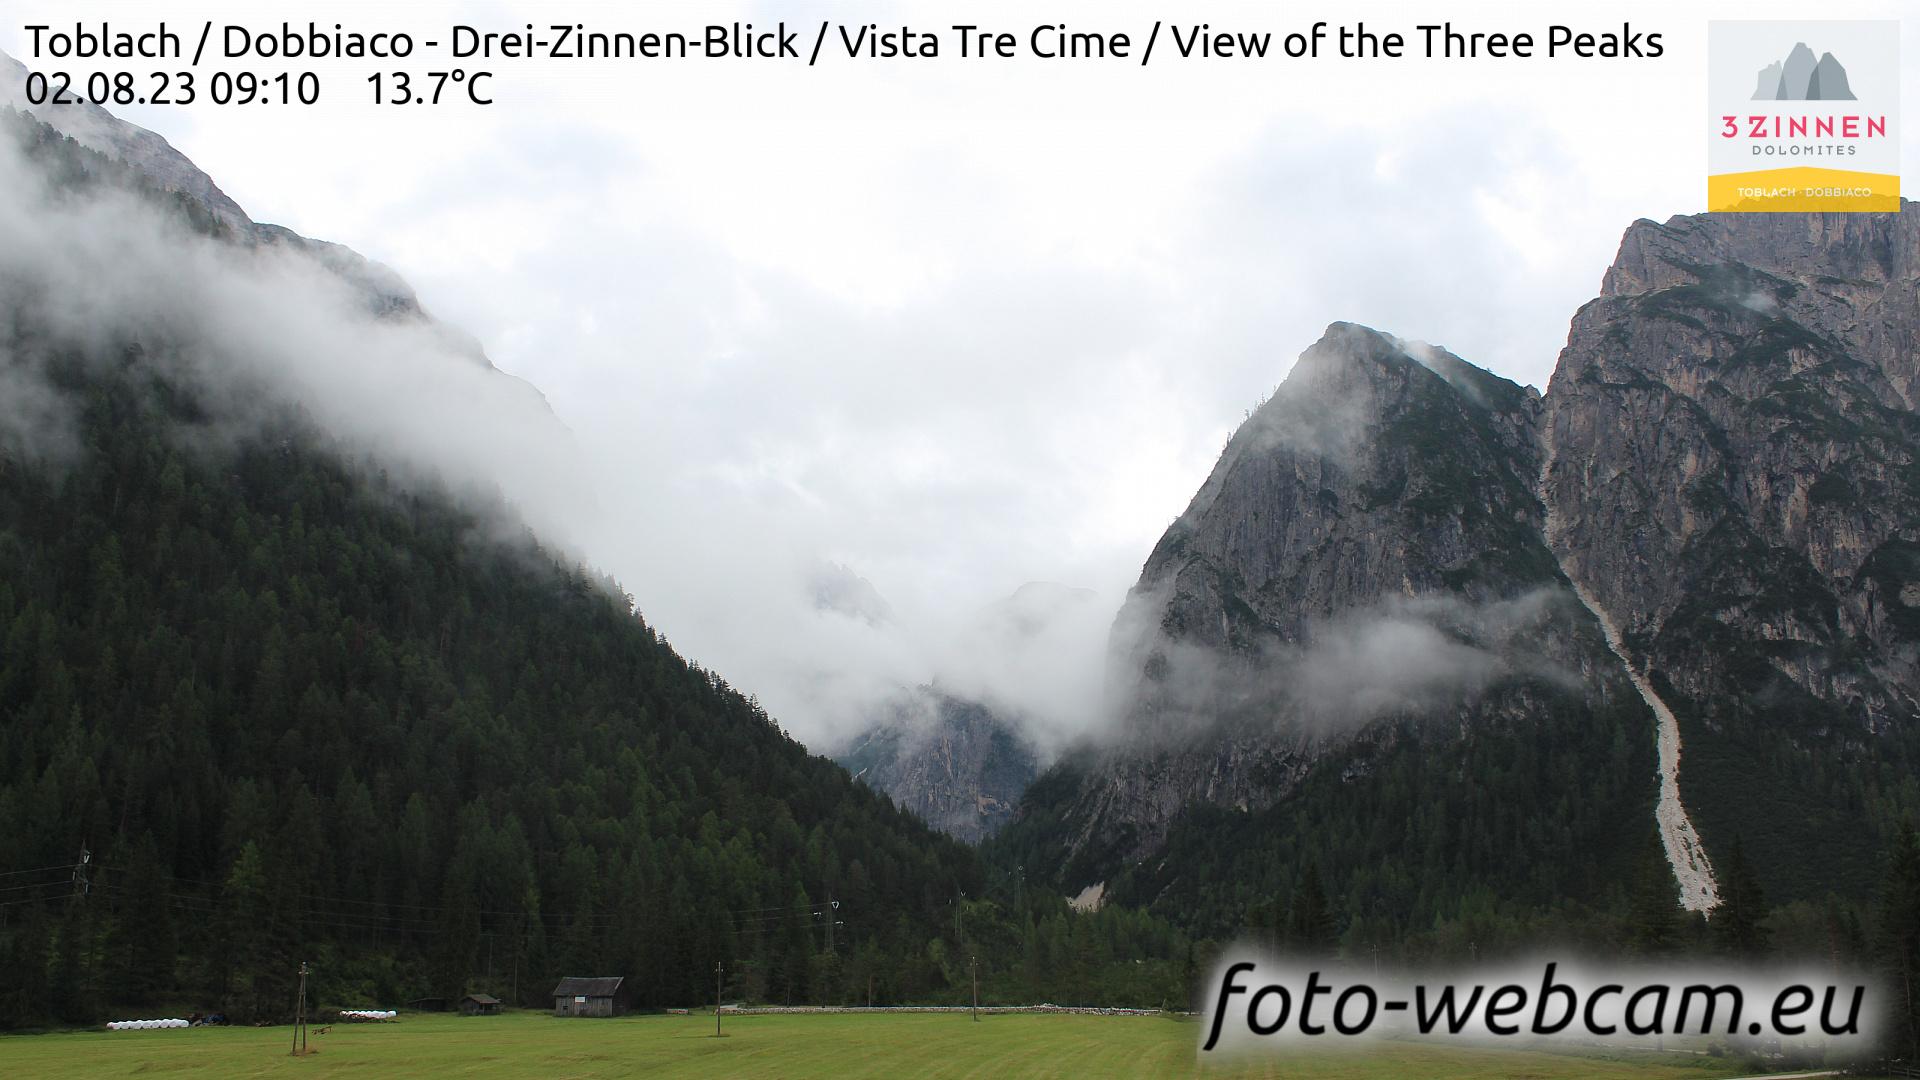 Toblach (Dolomites) Tue. 09:27